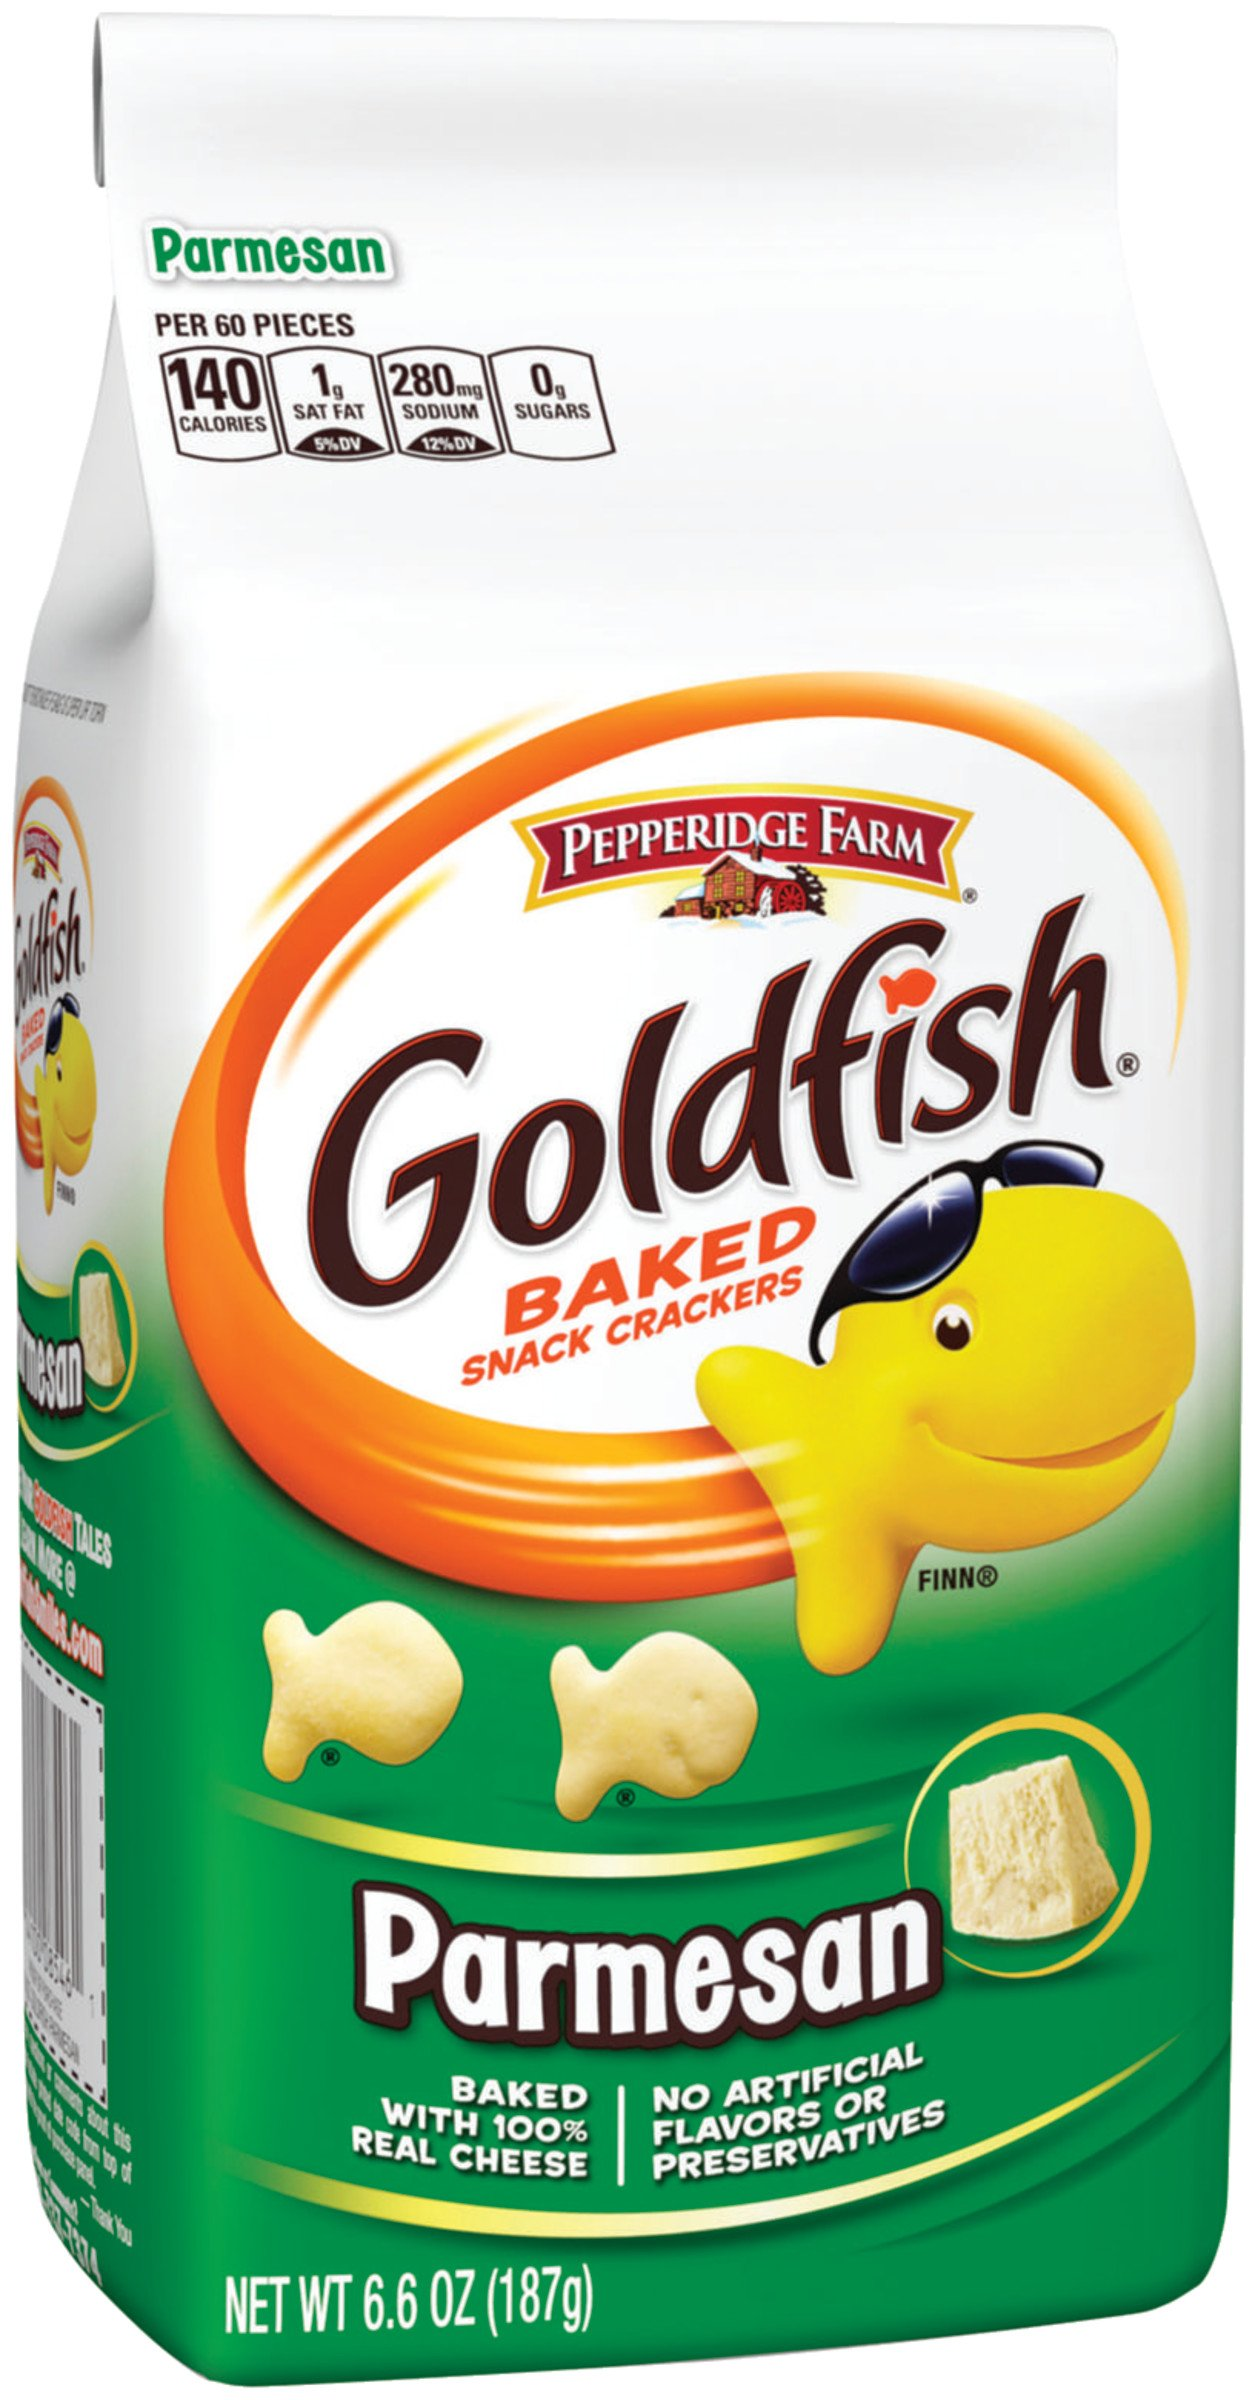 Pepperidge Farm, Goldfish, Crackers, Parmesan, 6.6 oz, Bag, 24-count